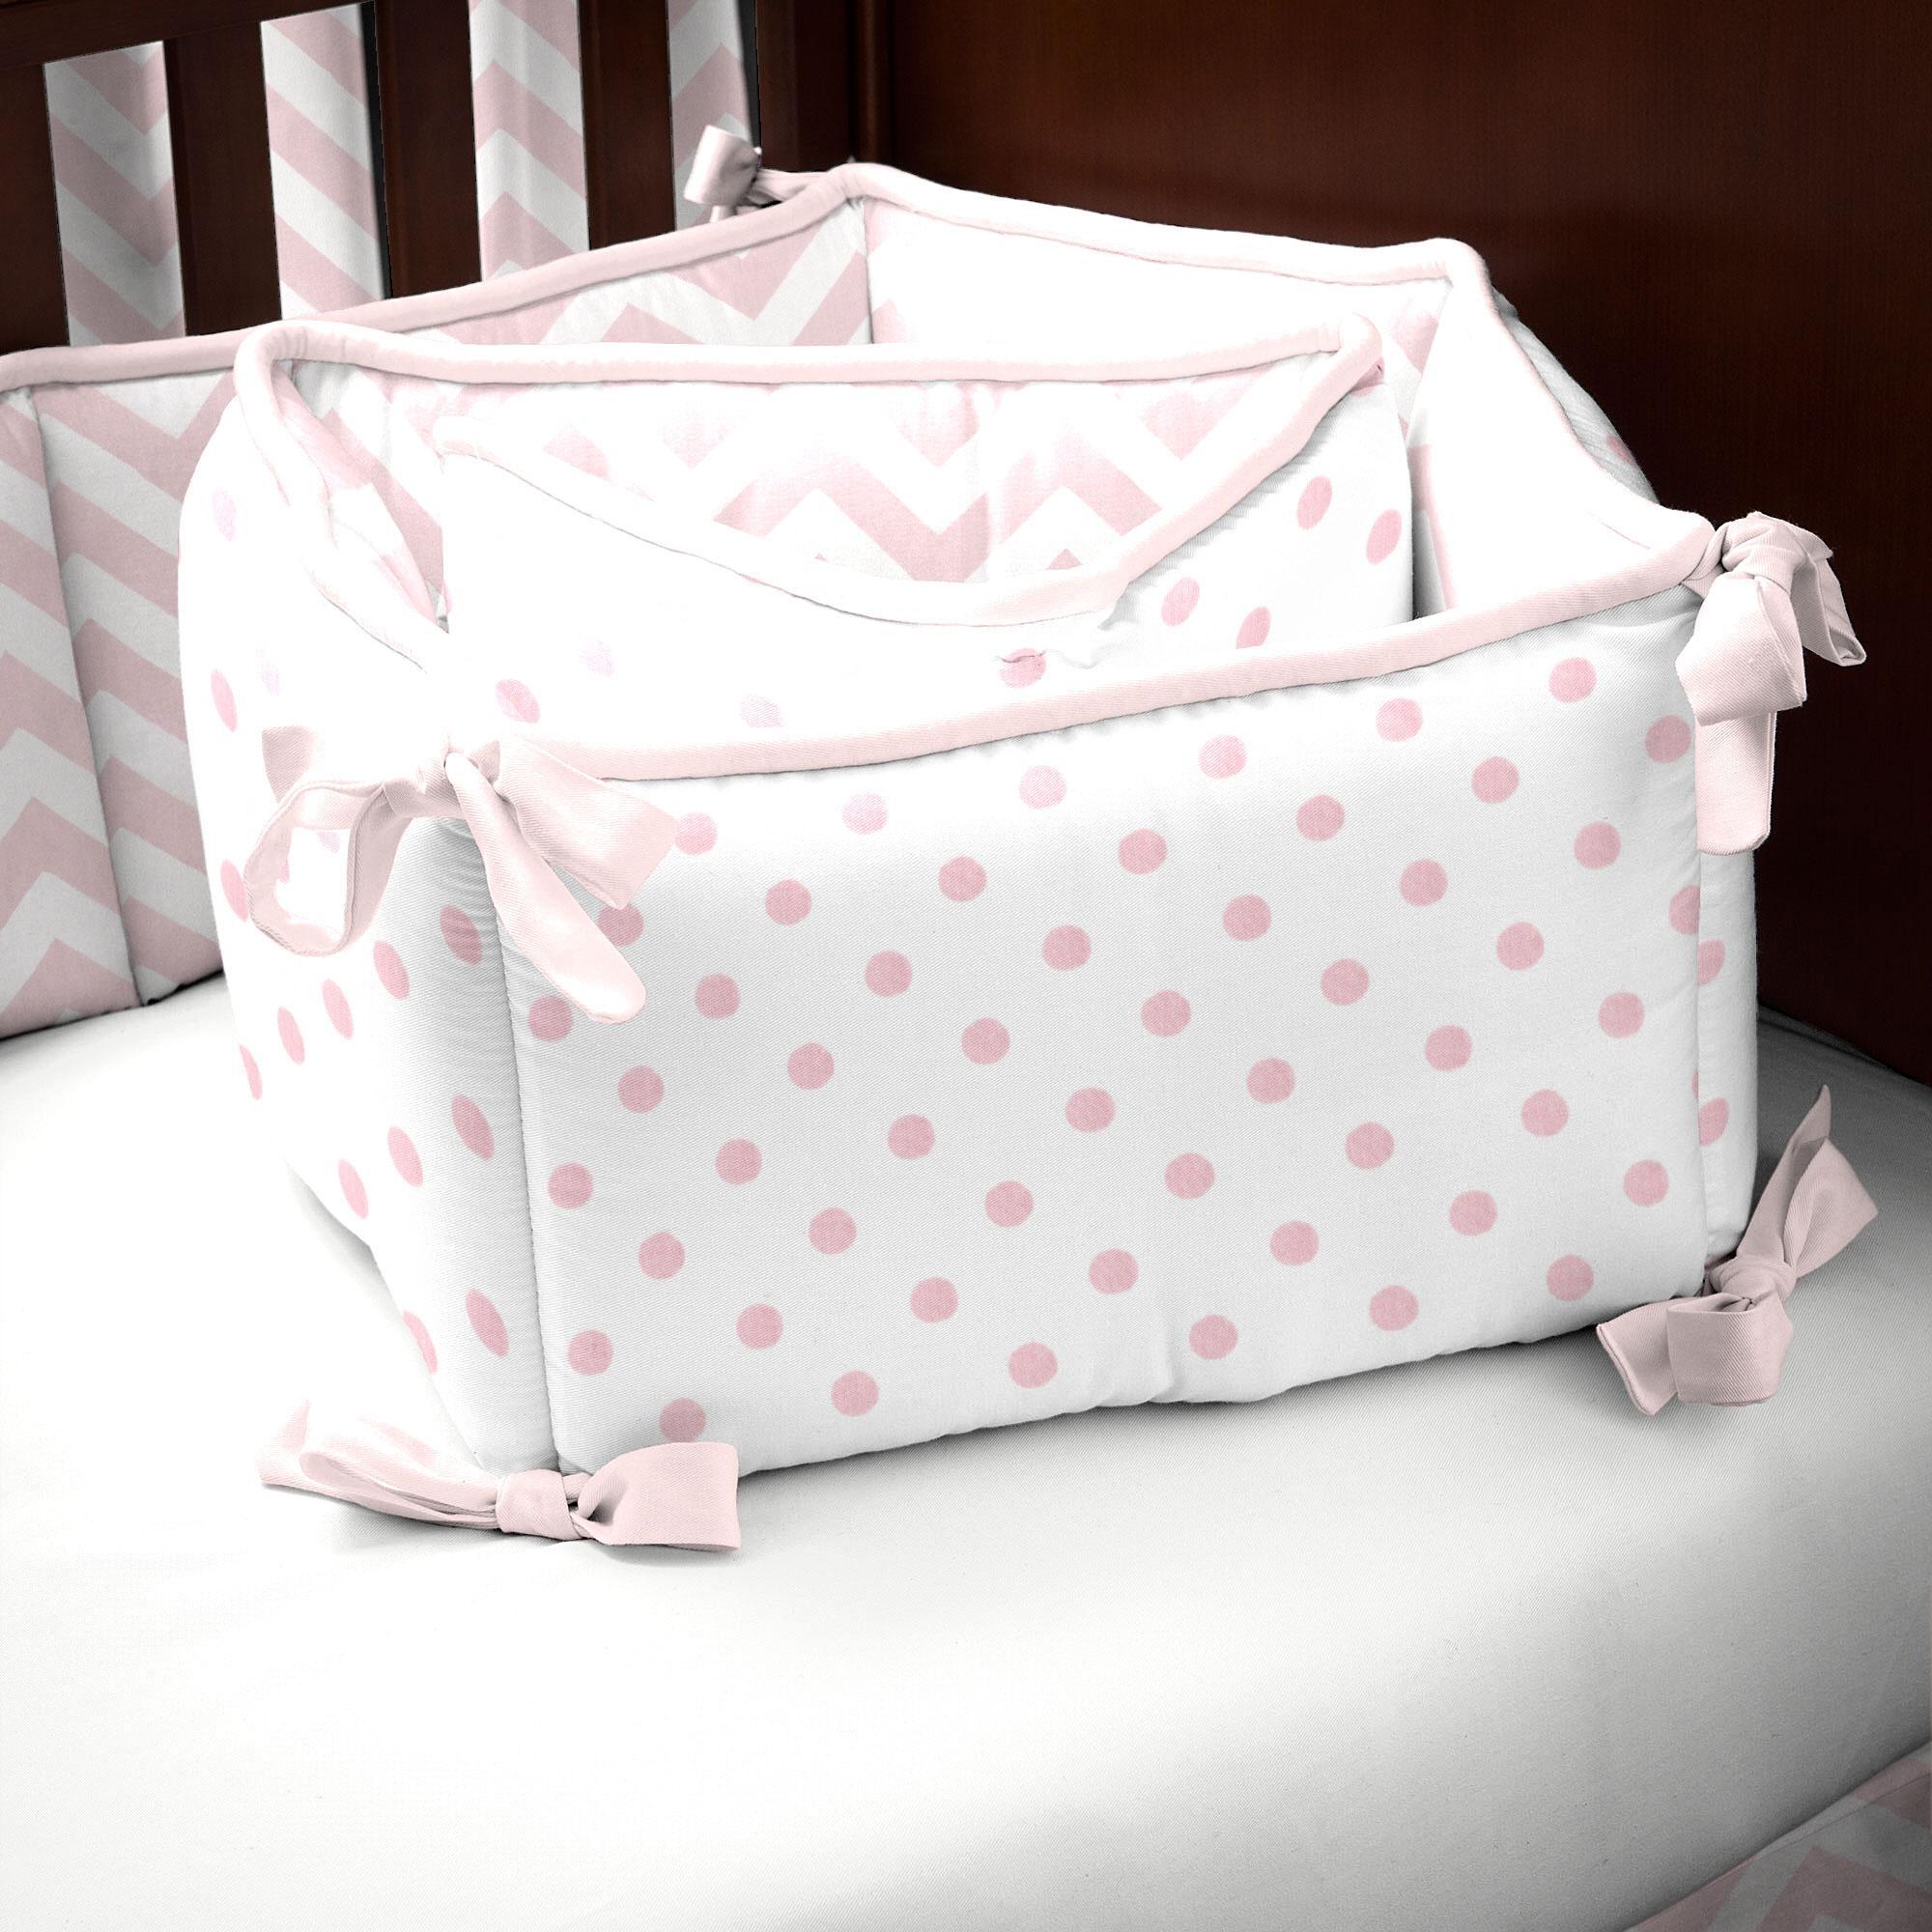 Amazon Baby Crib | Crib Bumper Pads | Walmart Crib Bumper